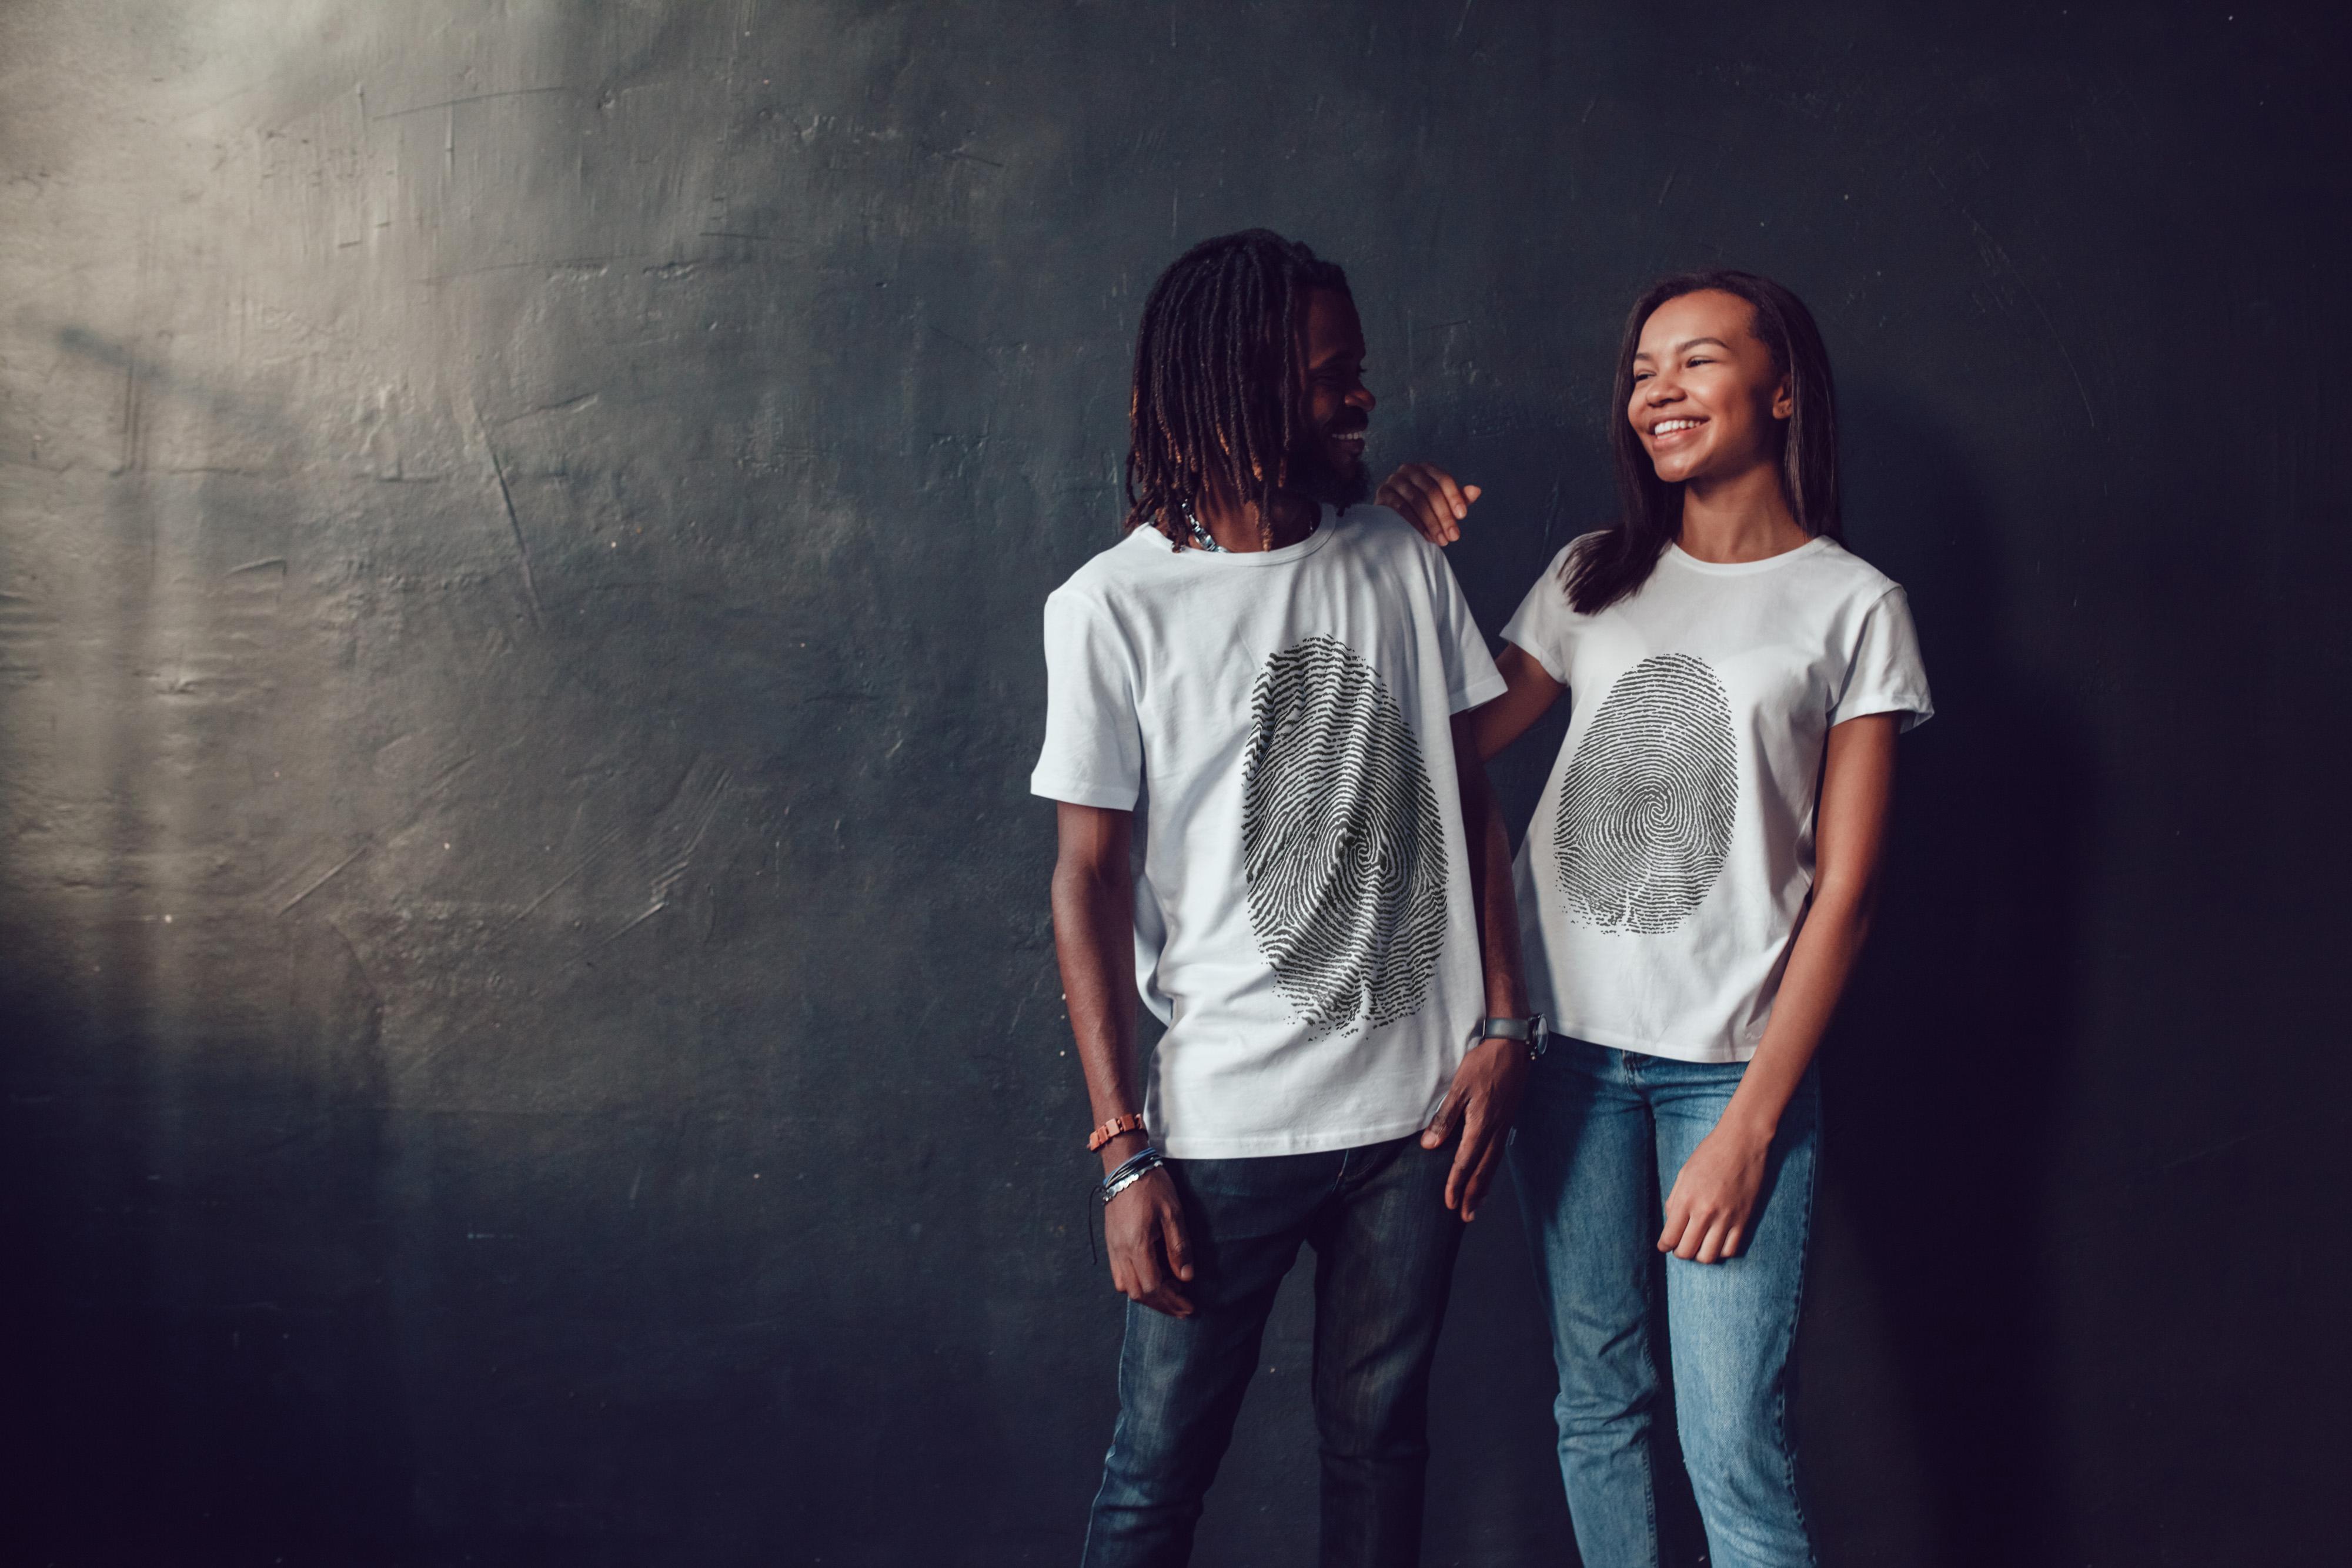 T-Shirt Mock-Up 2018 #1 example image 13